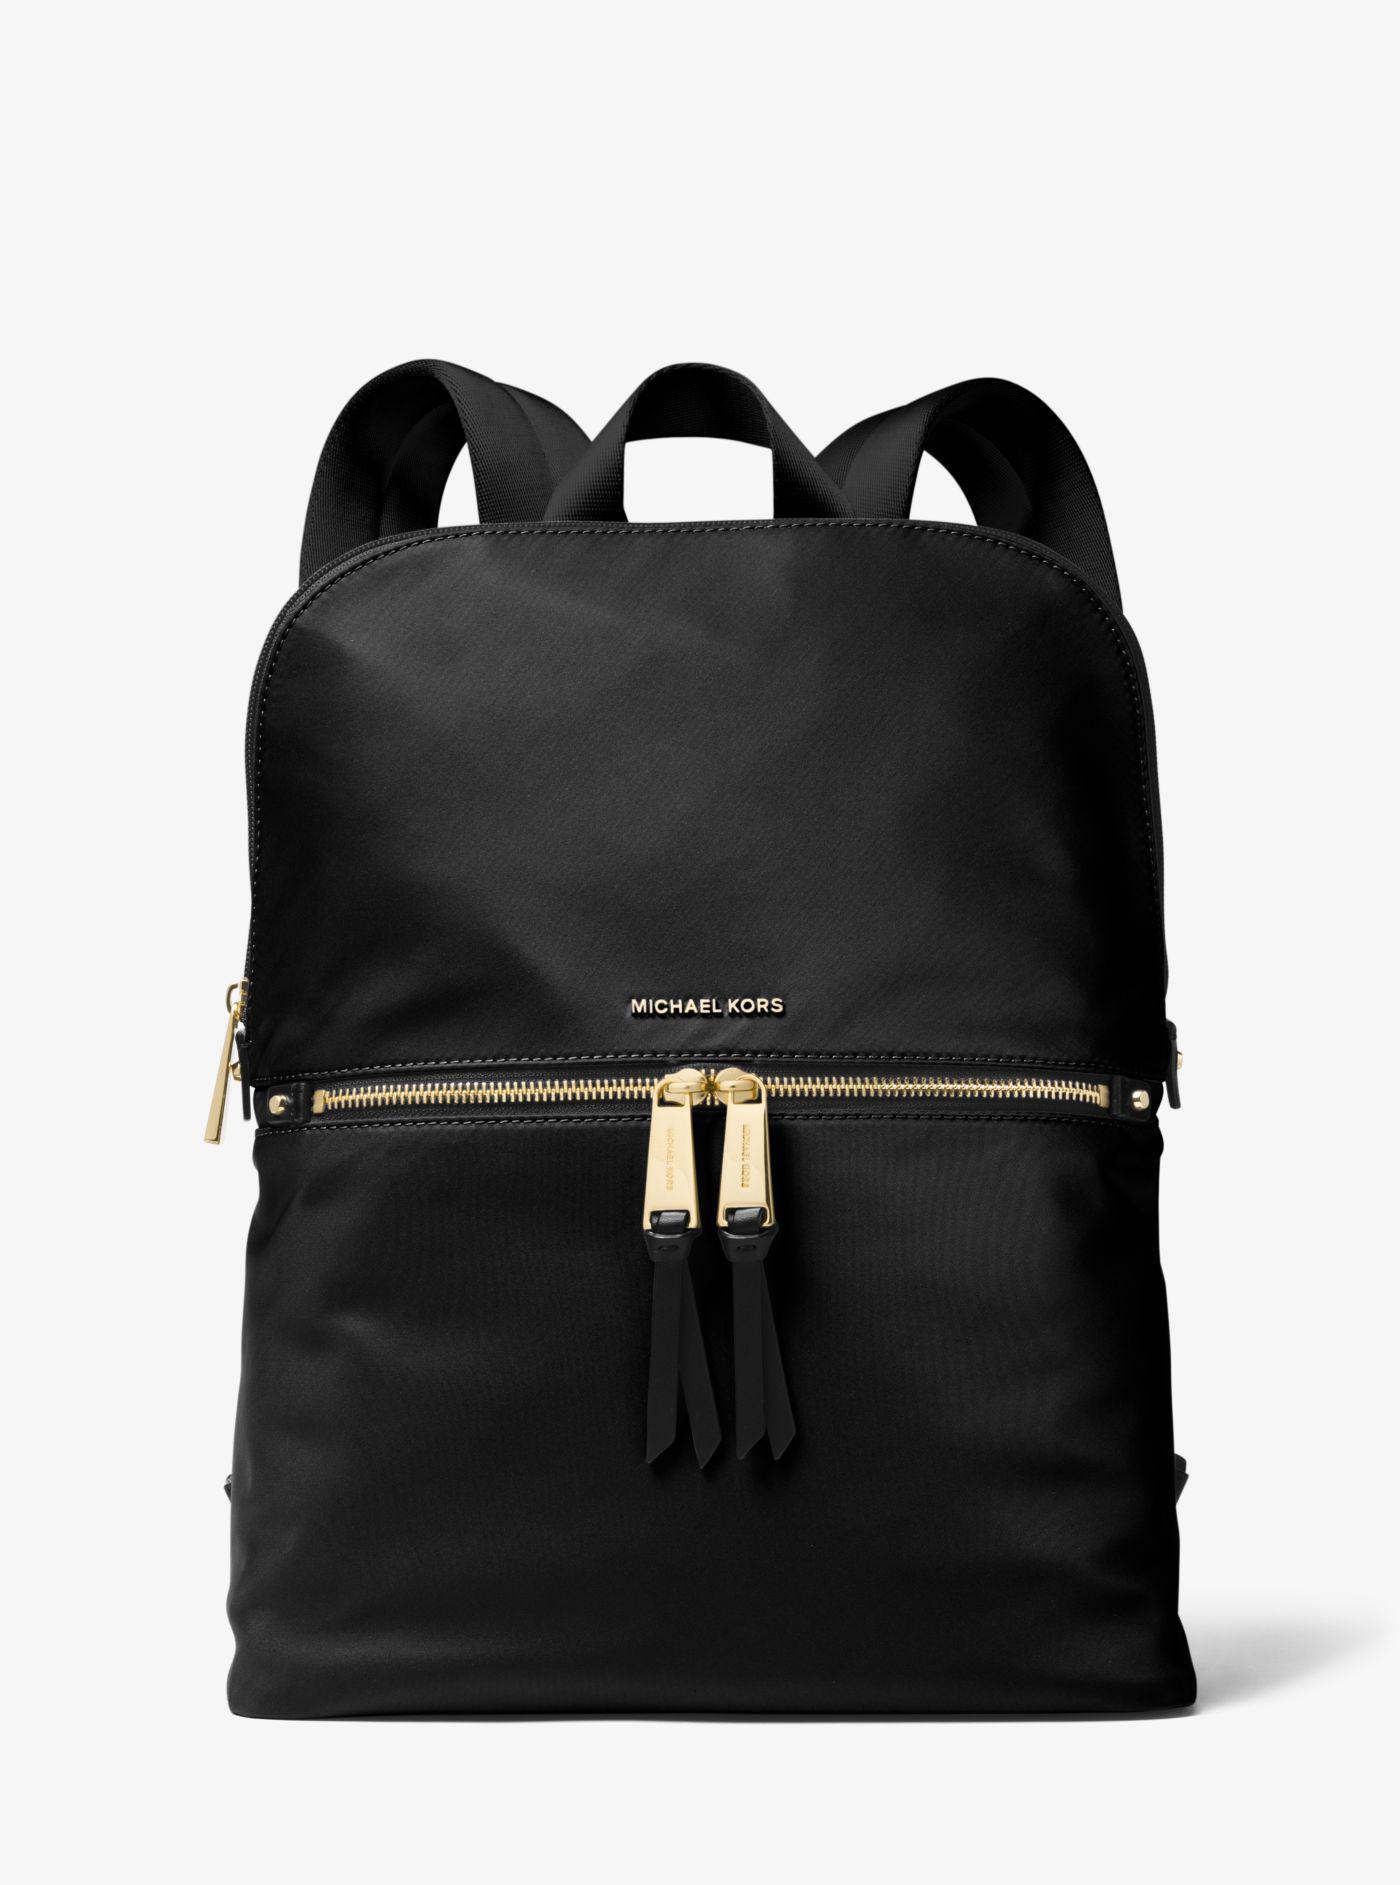 8c48dfe6f5975 Michael Kors - Black Polly Medium Nylon Backpack - Lyst. View fullscreen